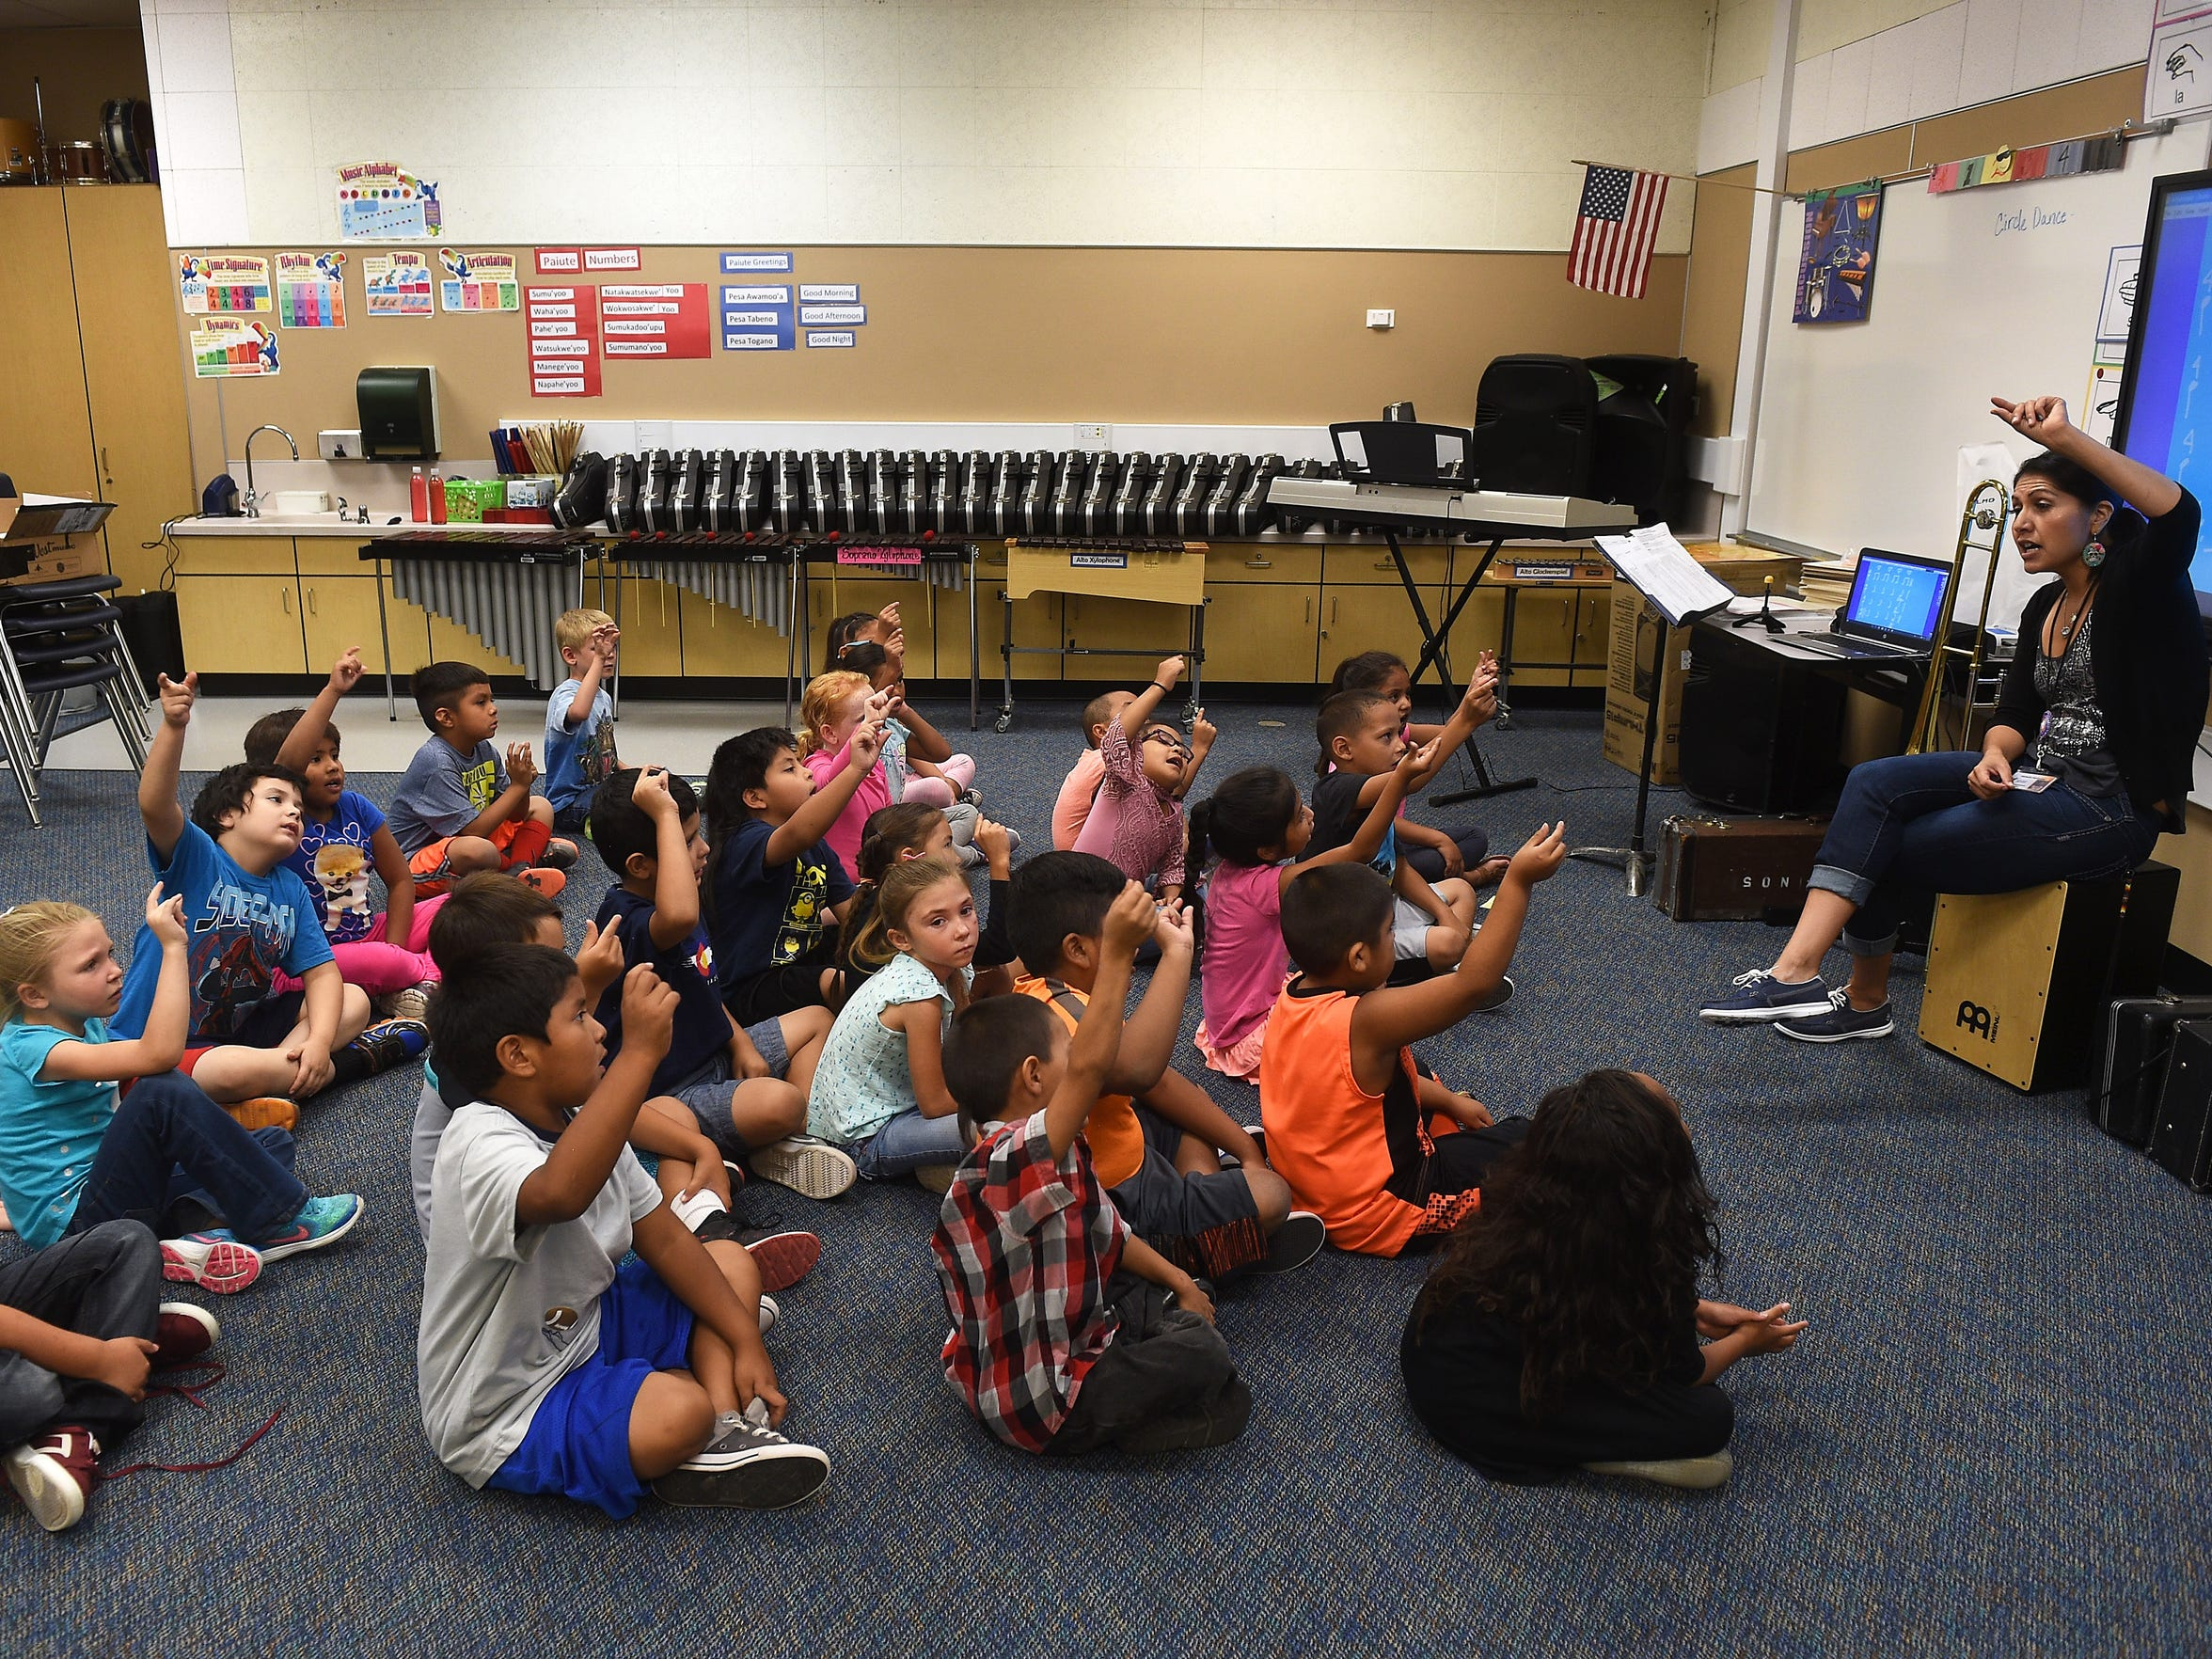 Music teacher Michelle McCauley conducts a class at